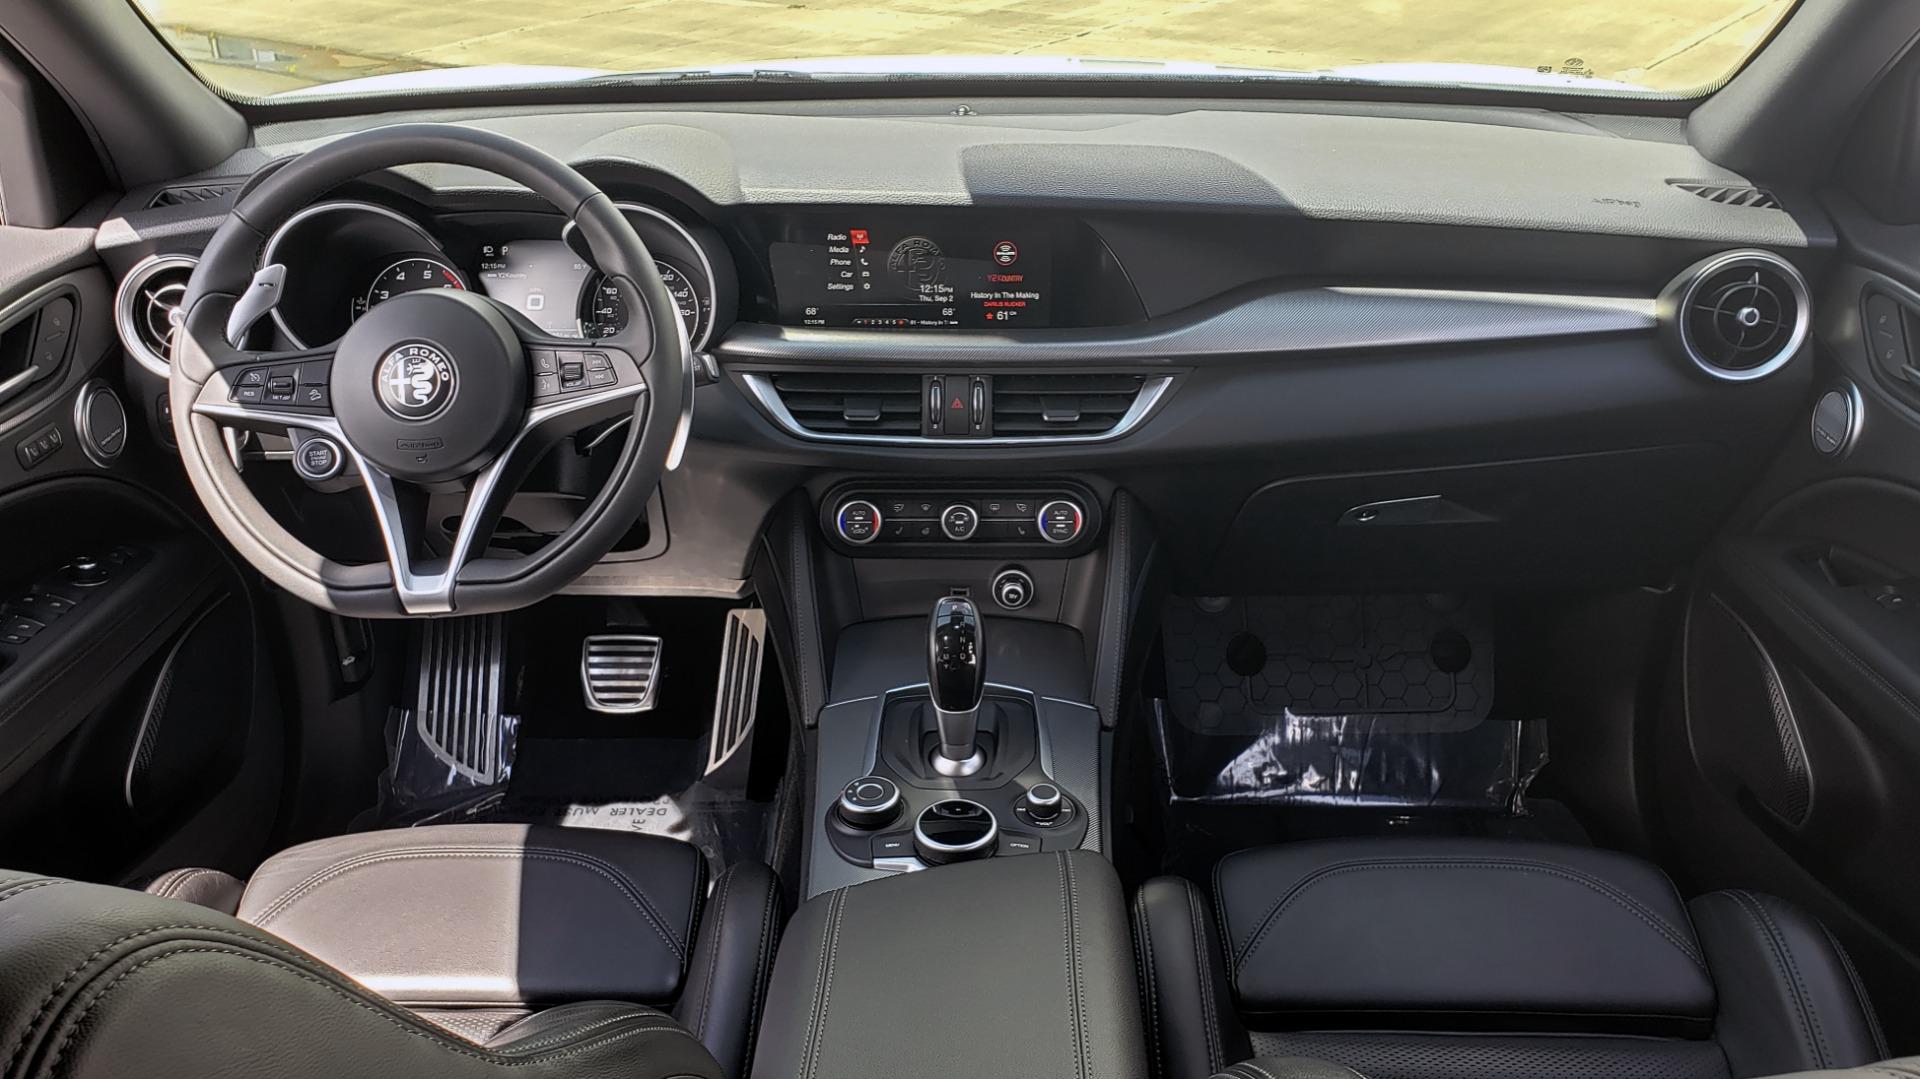 Used 2019 Alfa Romeo STELVIO TI SPORT AWD / 2.0L TURBO / 8-SPD AUTO / DRVR ASST / REARVIEW for sale $37,495 at Formula Imports in Charlotte NC 28227 81